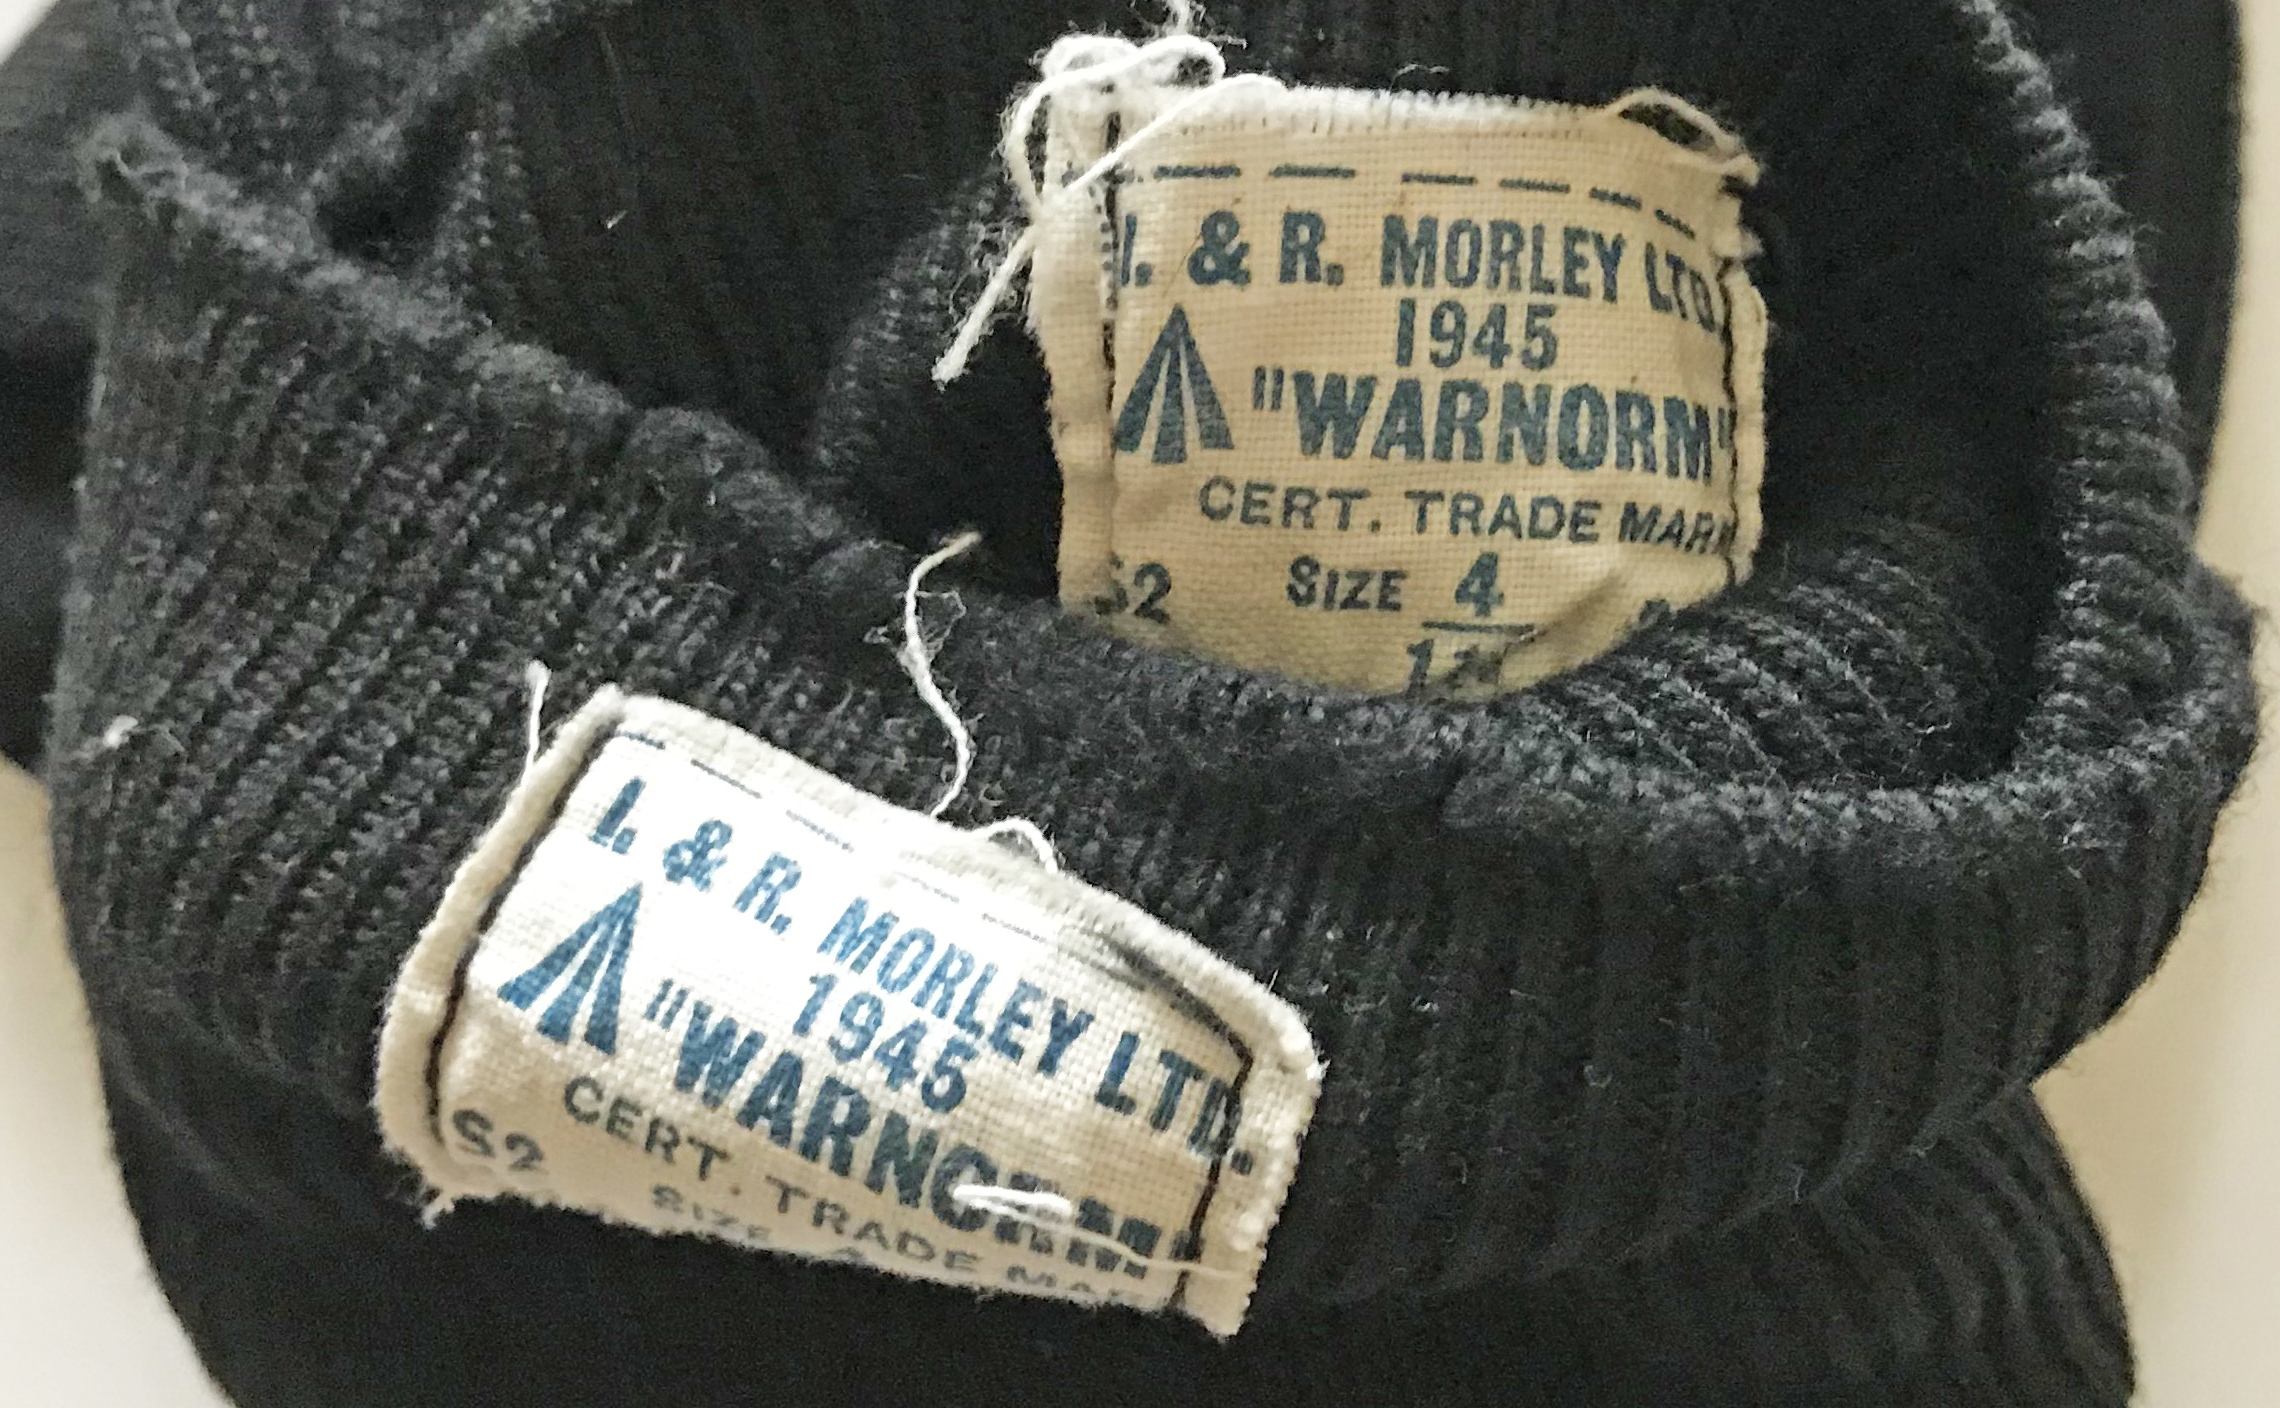 RAF uniform dress socks dated 1945